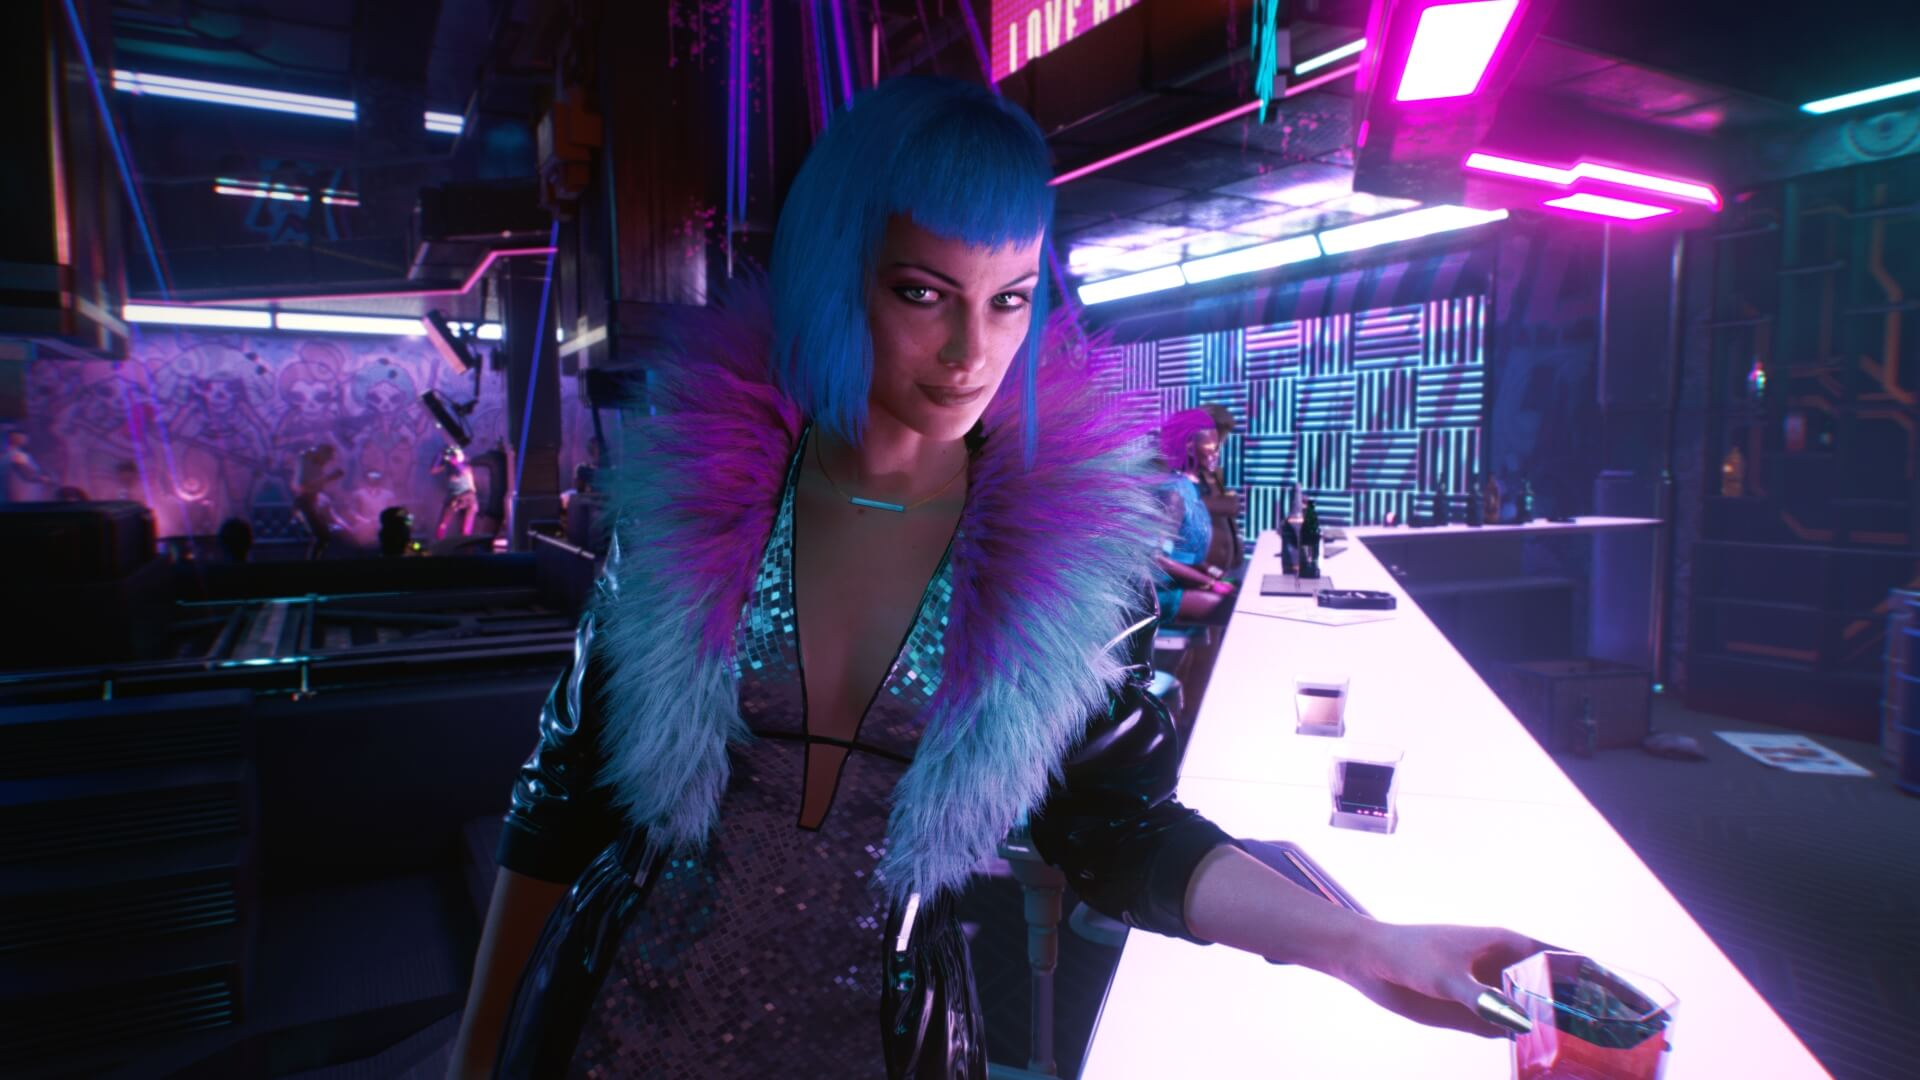 Evelyn from Cyberpunk 2077